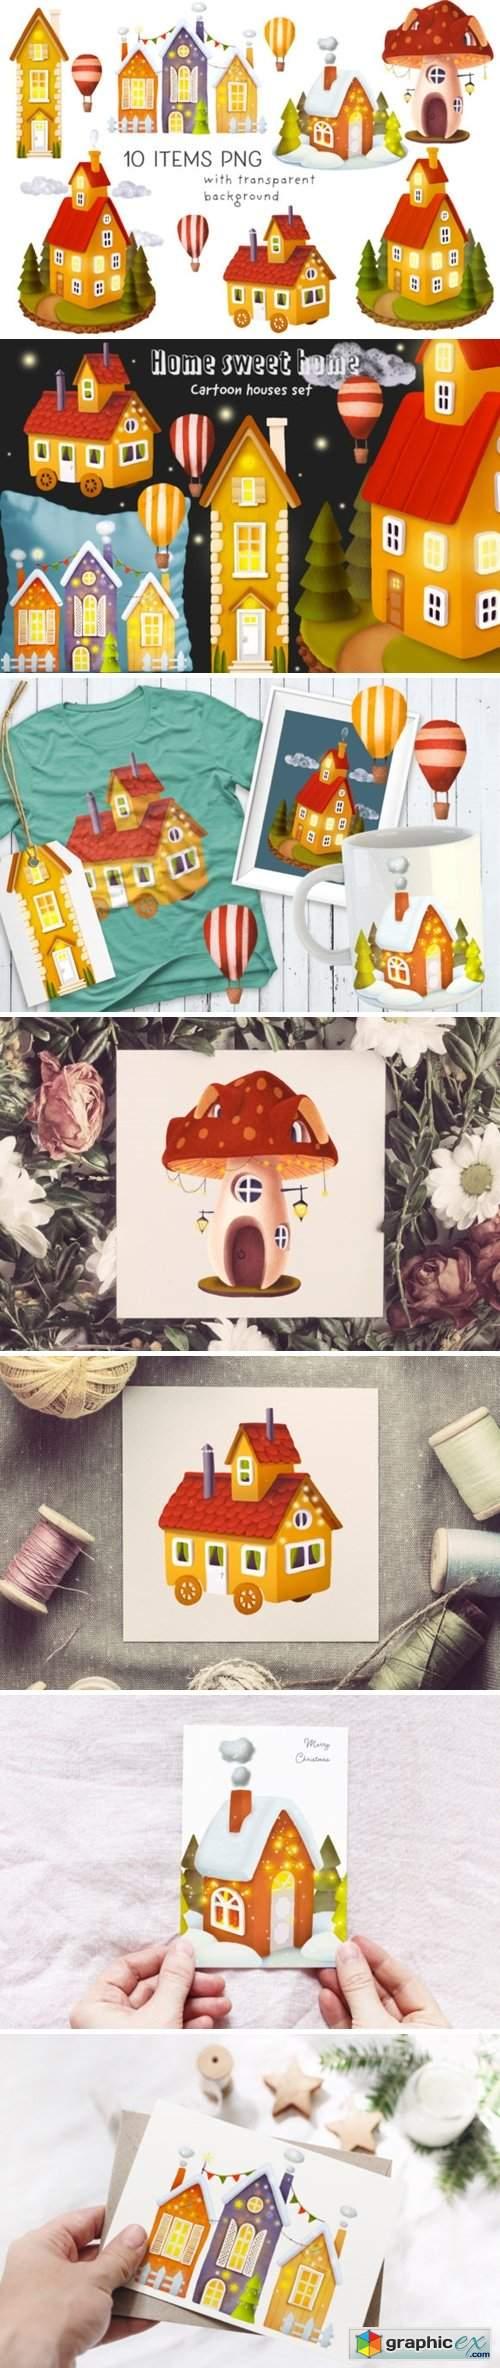 House Illustrations Set